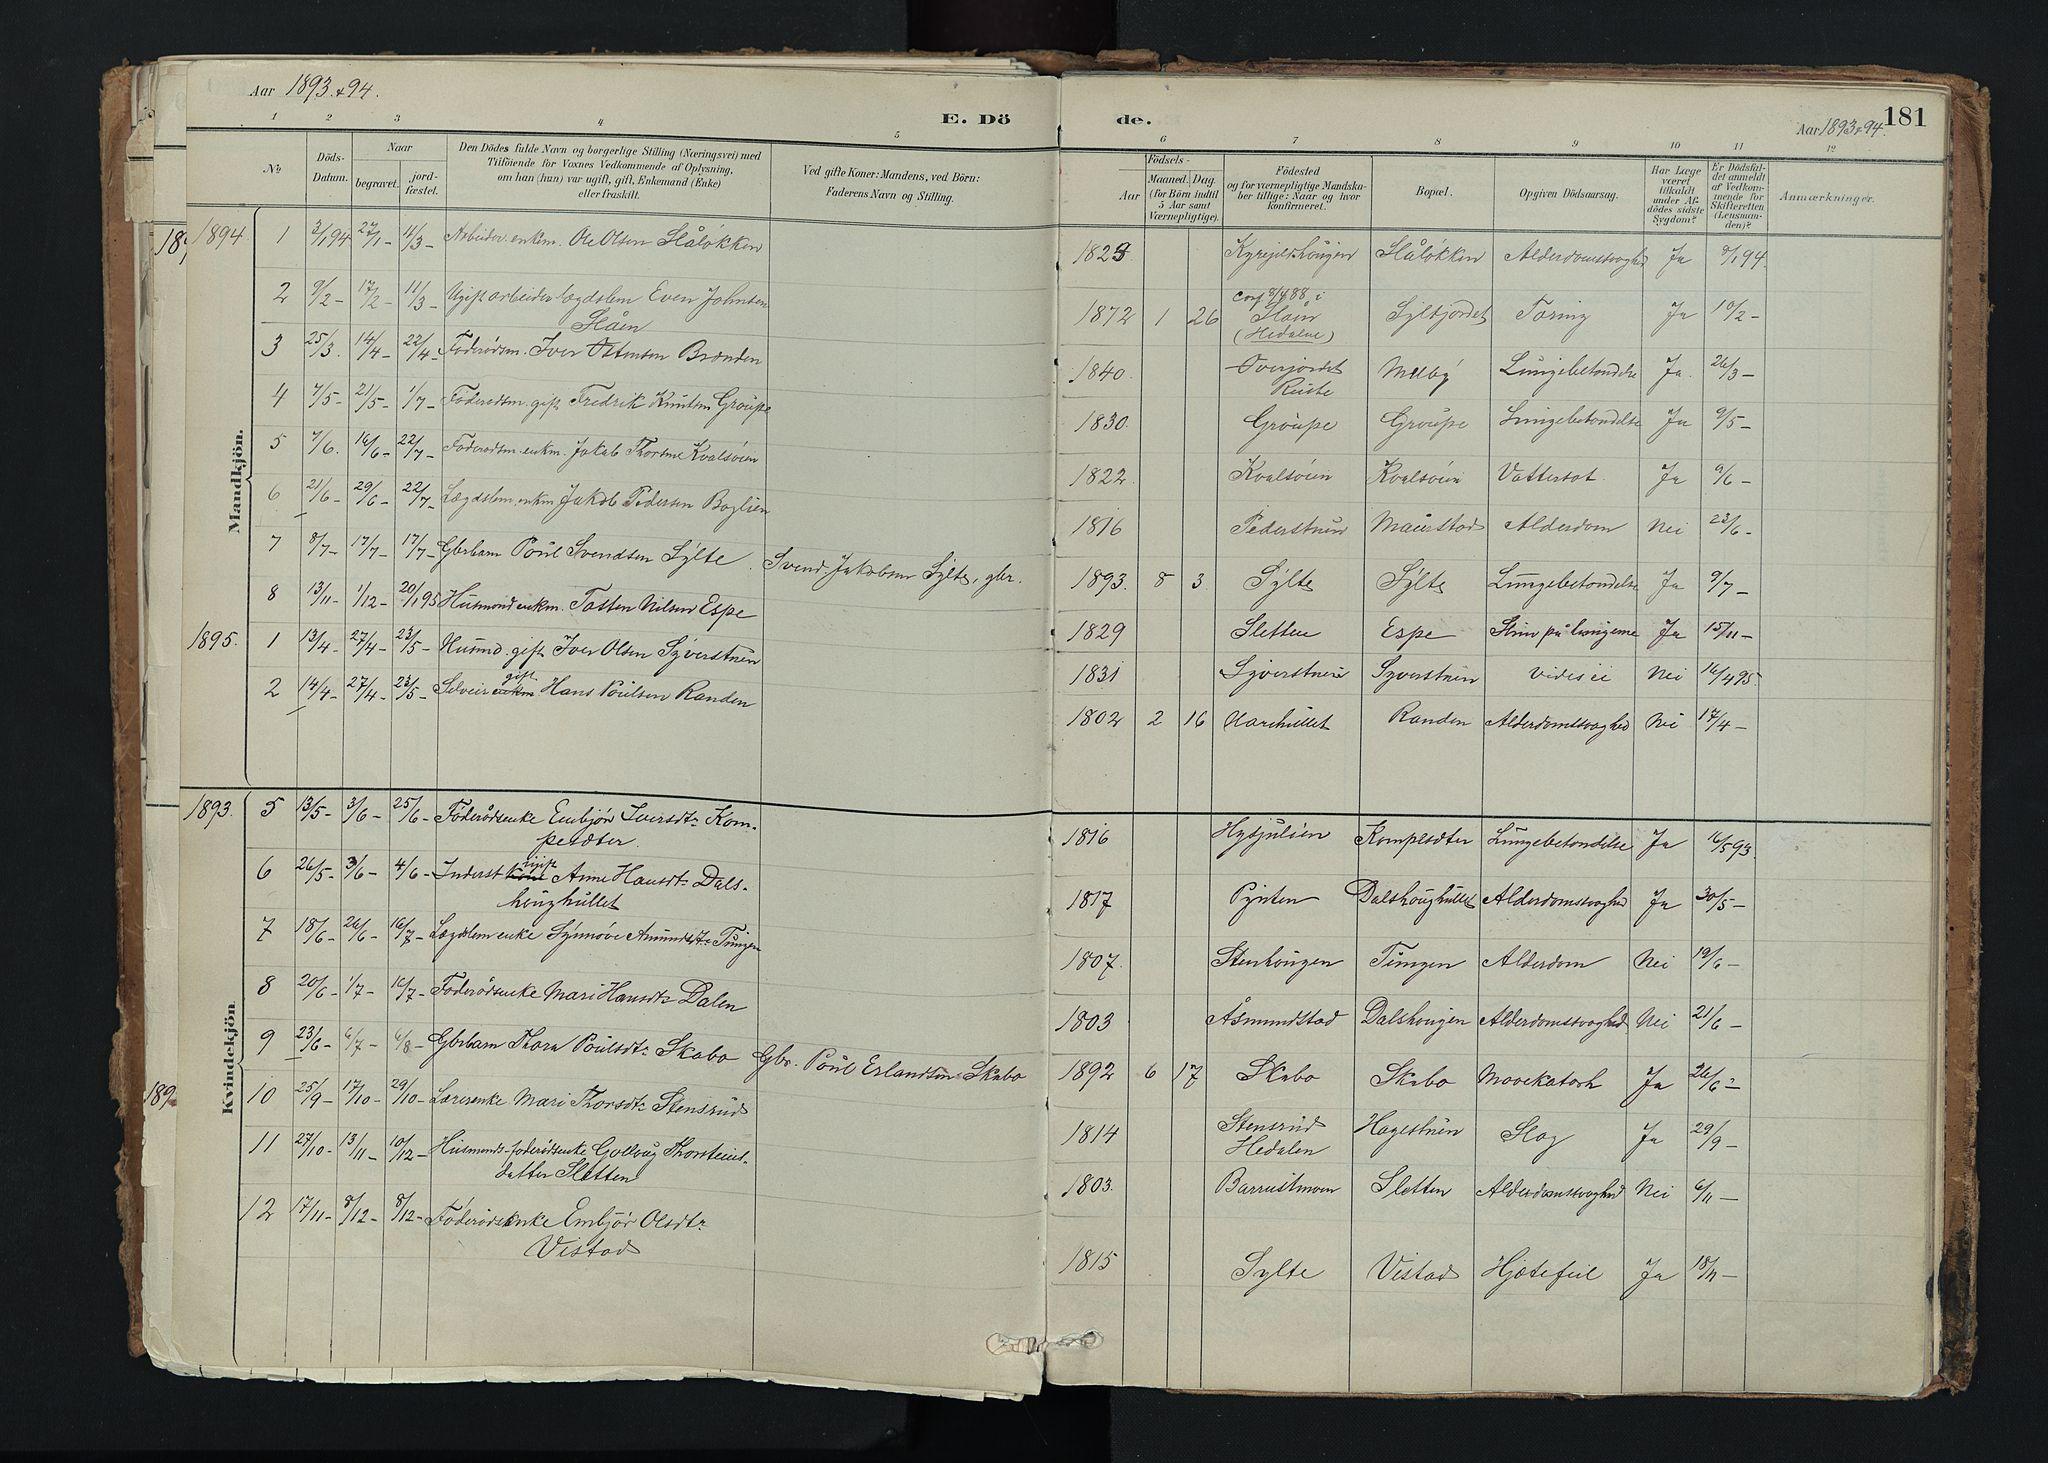 SAH, Nord-Fron prestekontor, Ministerialbok nr. 5, 1884-1914, s. 181